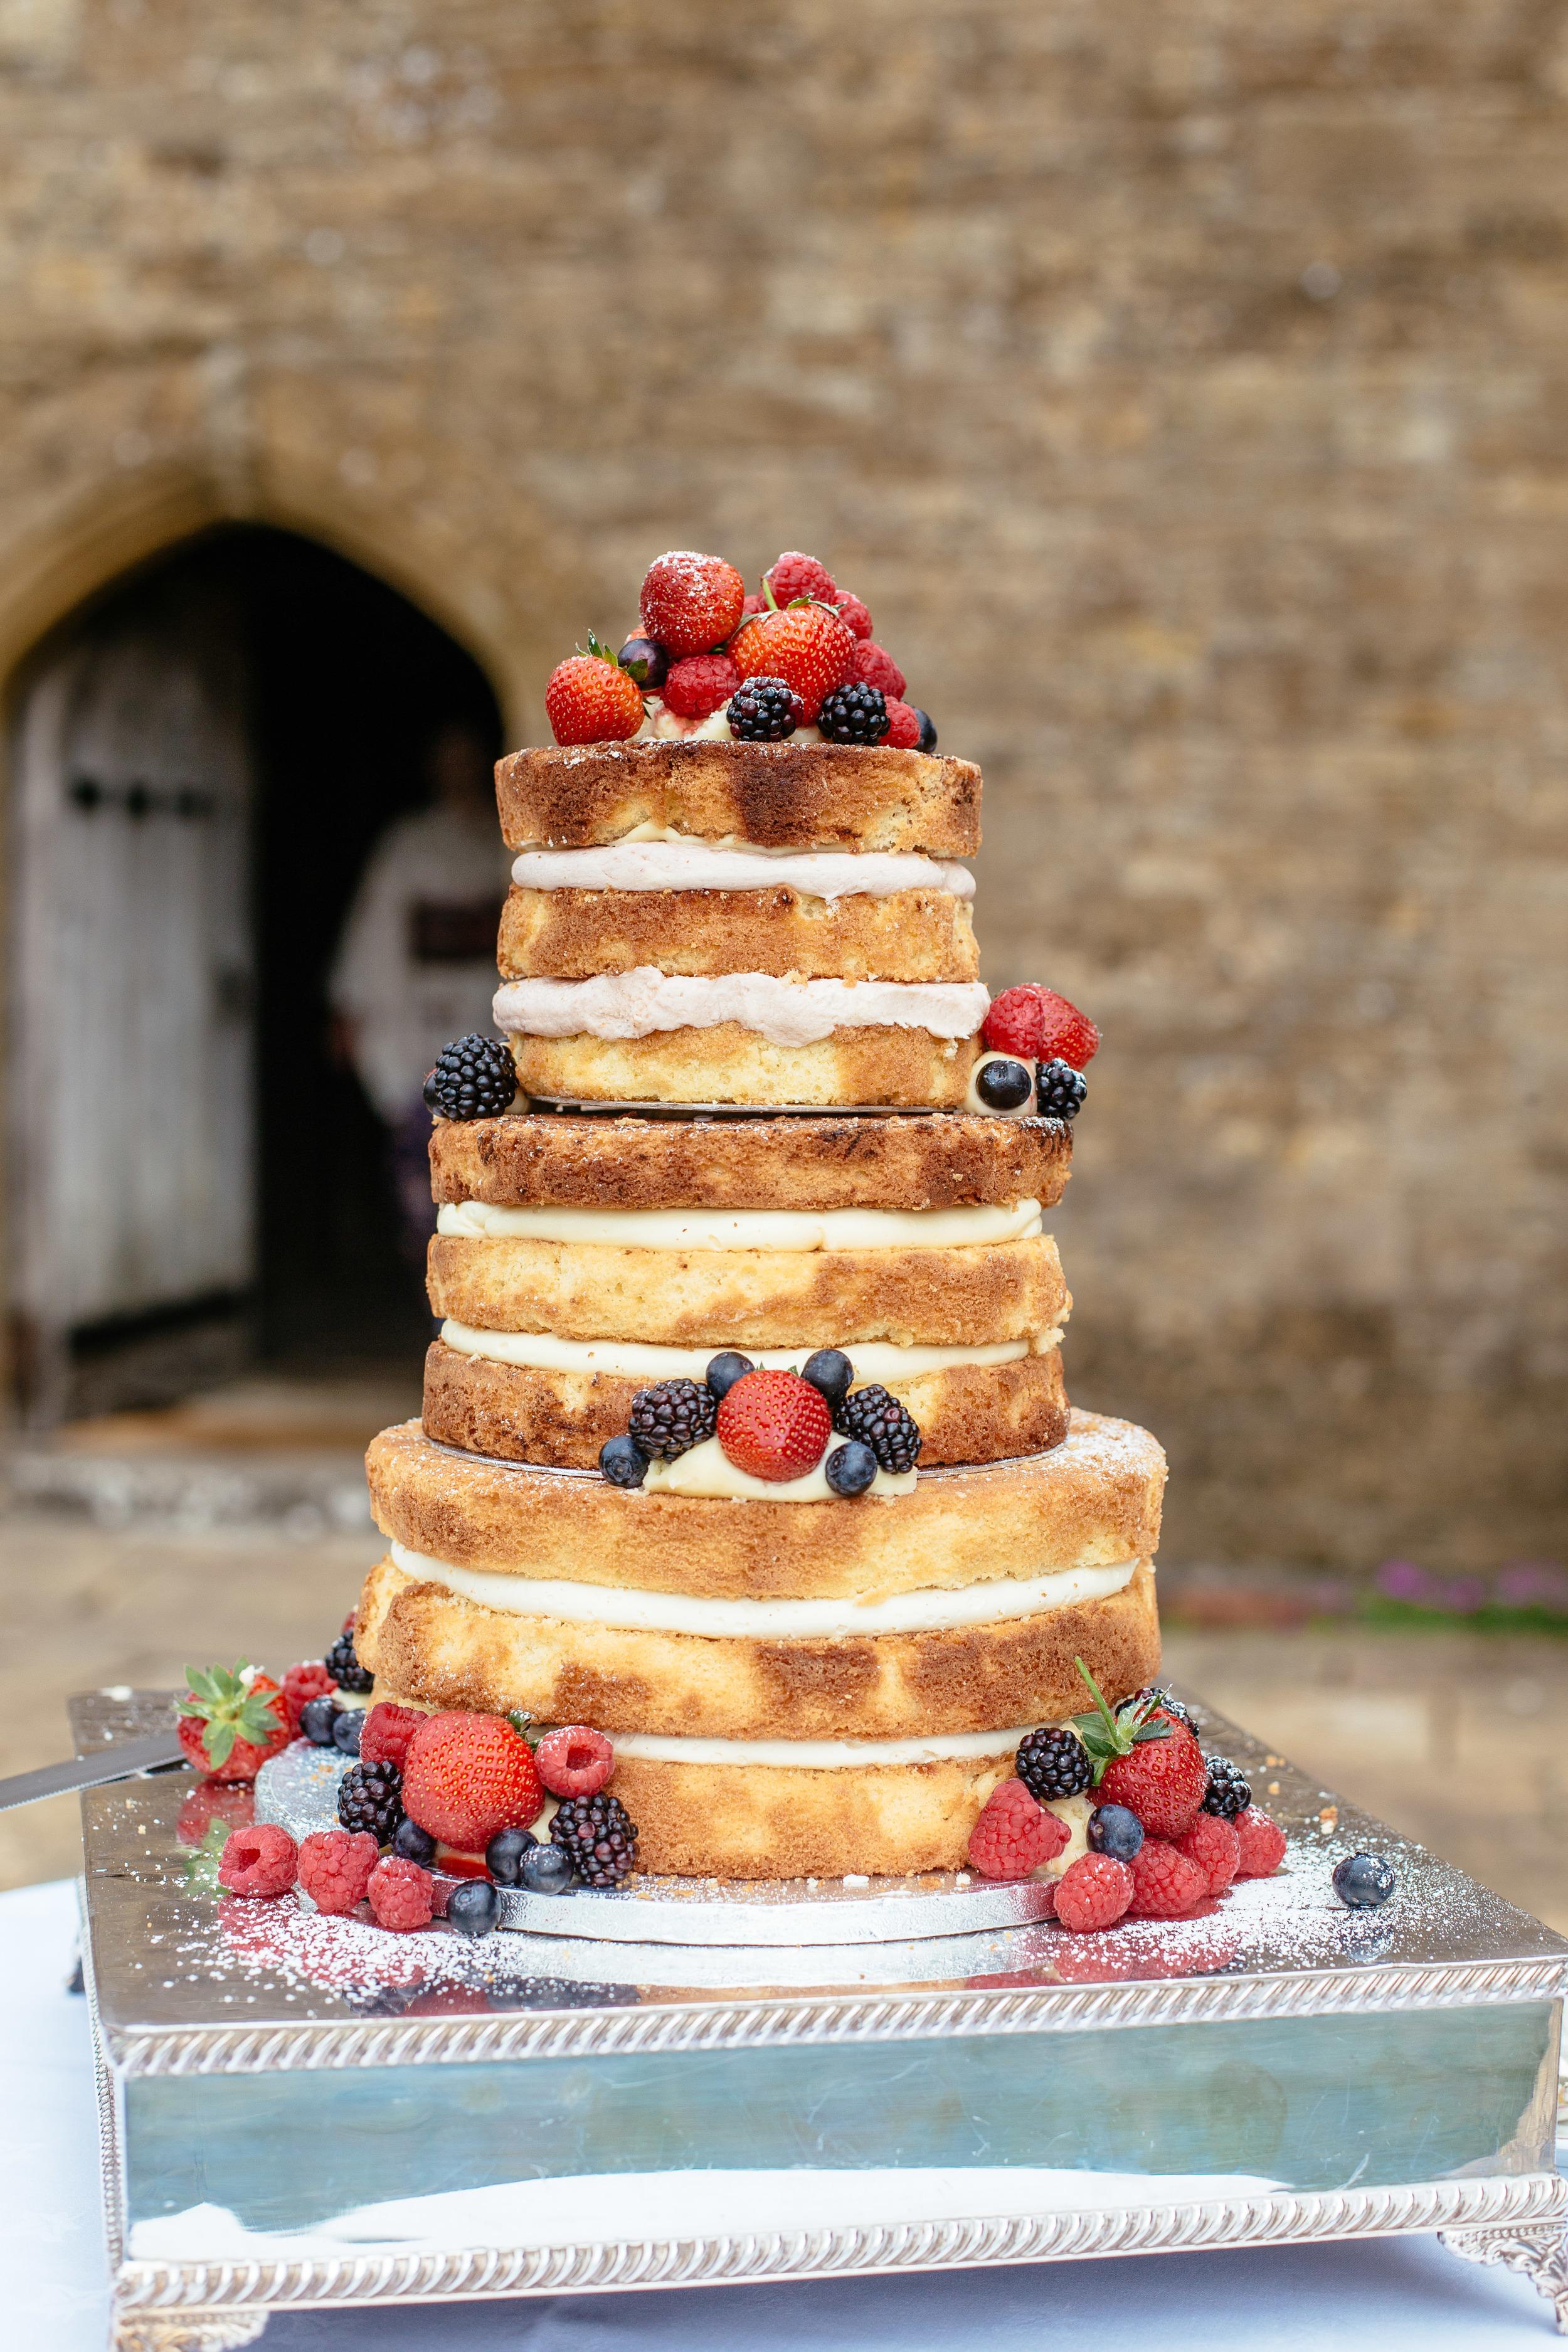 mahoka nick bailiffscourt wedding celebration-042.jpg